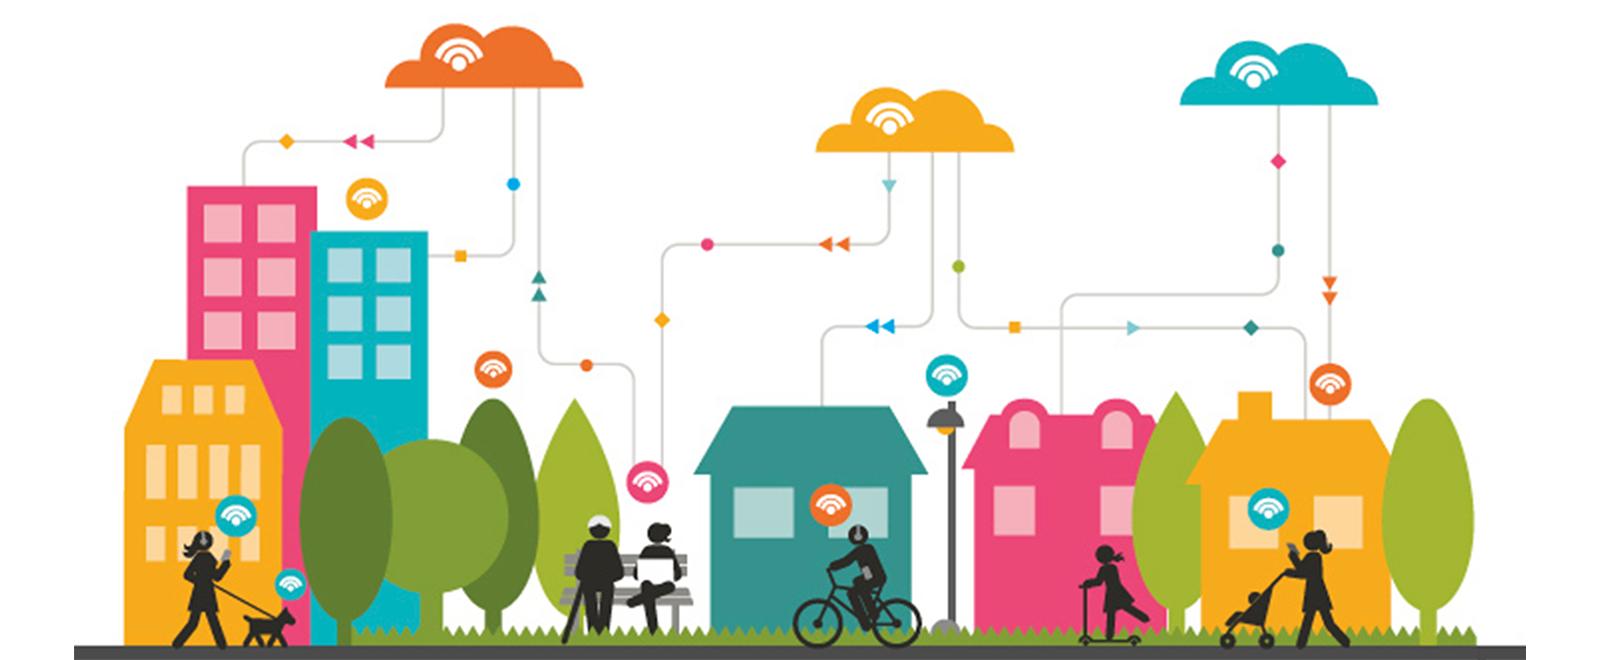 BRESCIA SMART LIVING - Essere una città intelligente